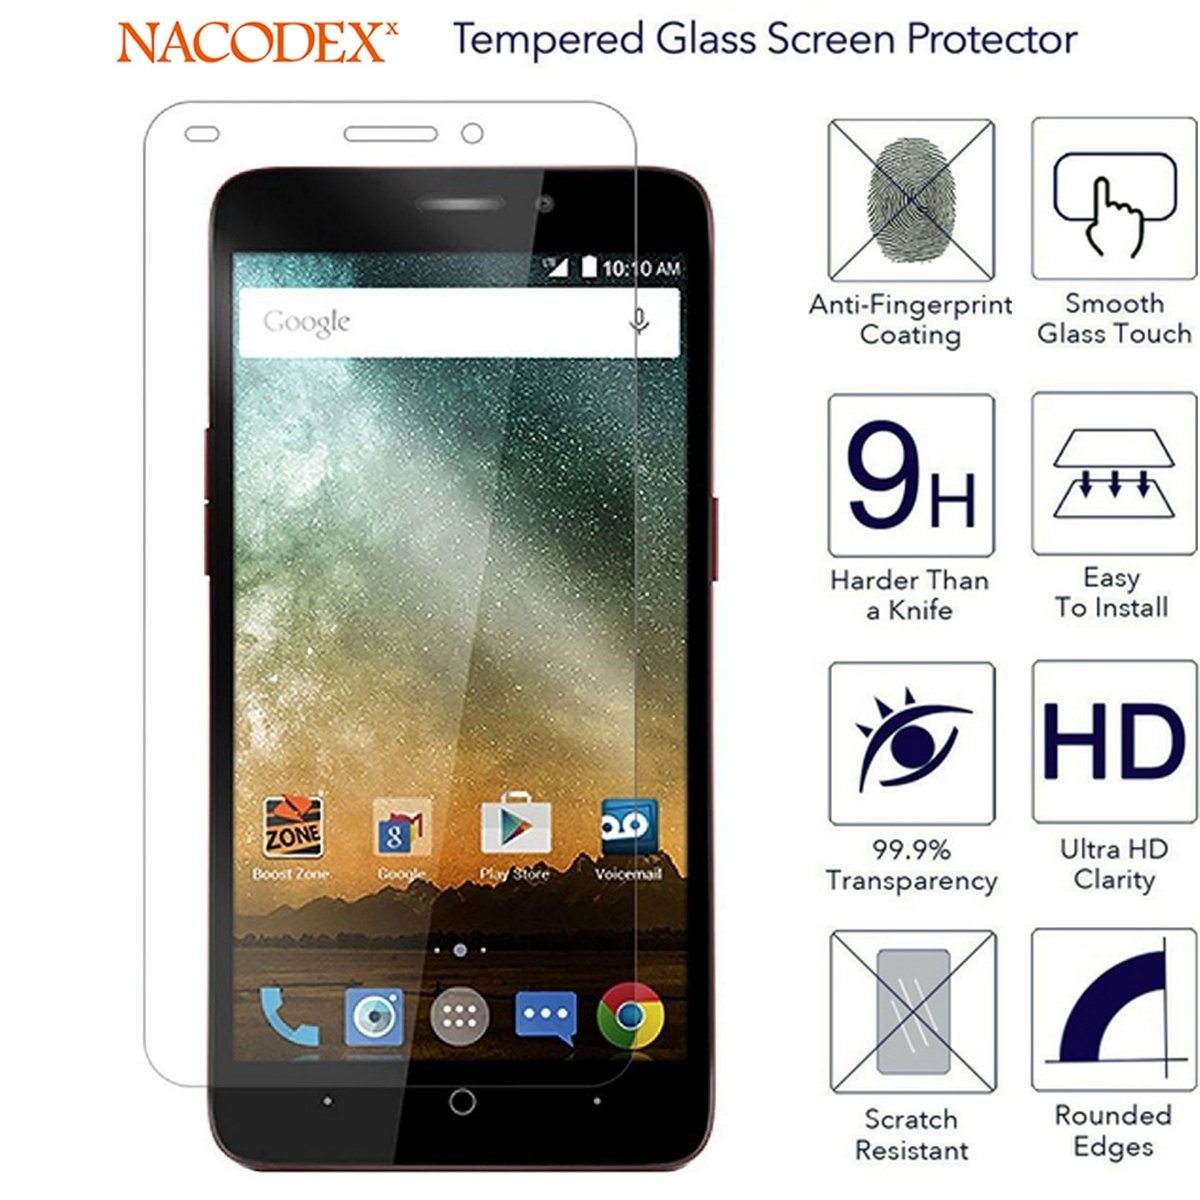 [3-Pack] For ZTE Sonata 3 Z832 Glass Screen Protector, Nacodex Premium  Tempered Glass Screen Protector 9H Hardness (For ZTE Sonata 3 Z832)